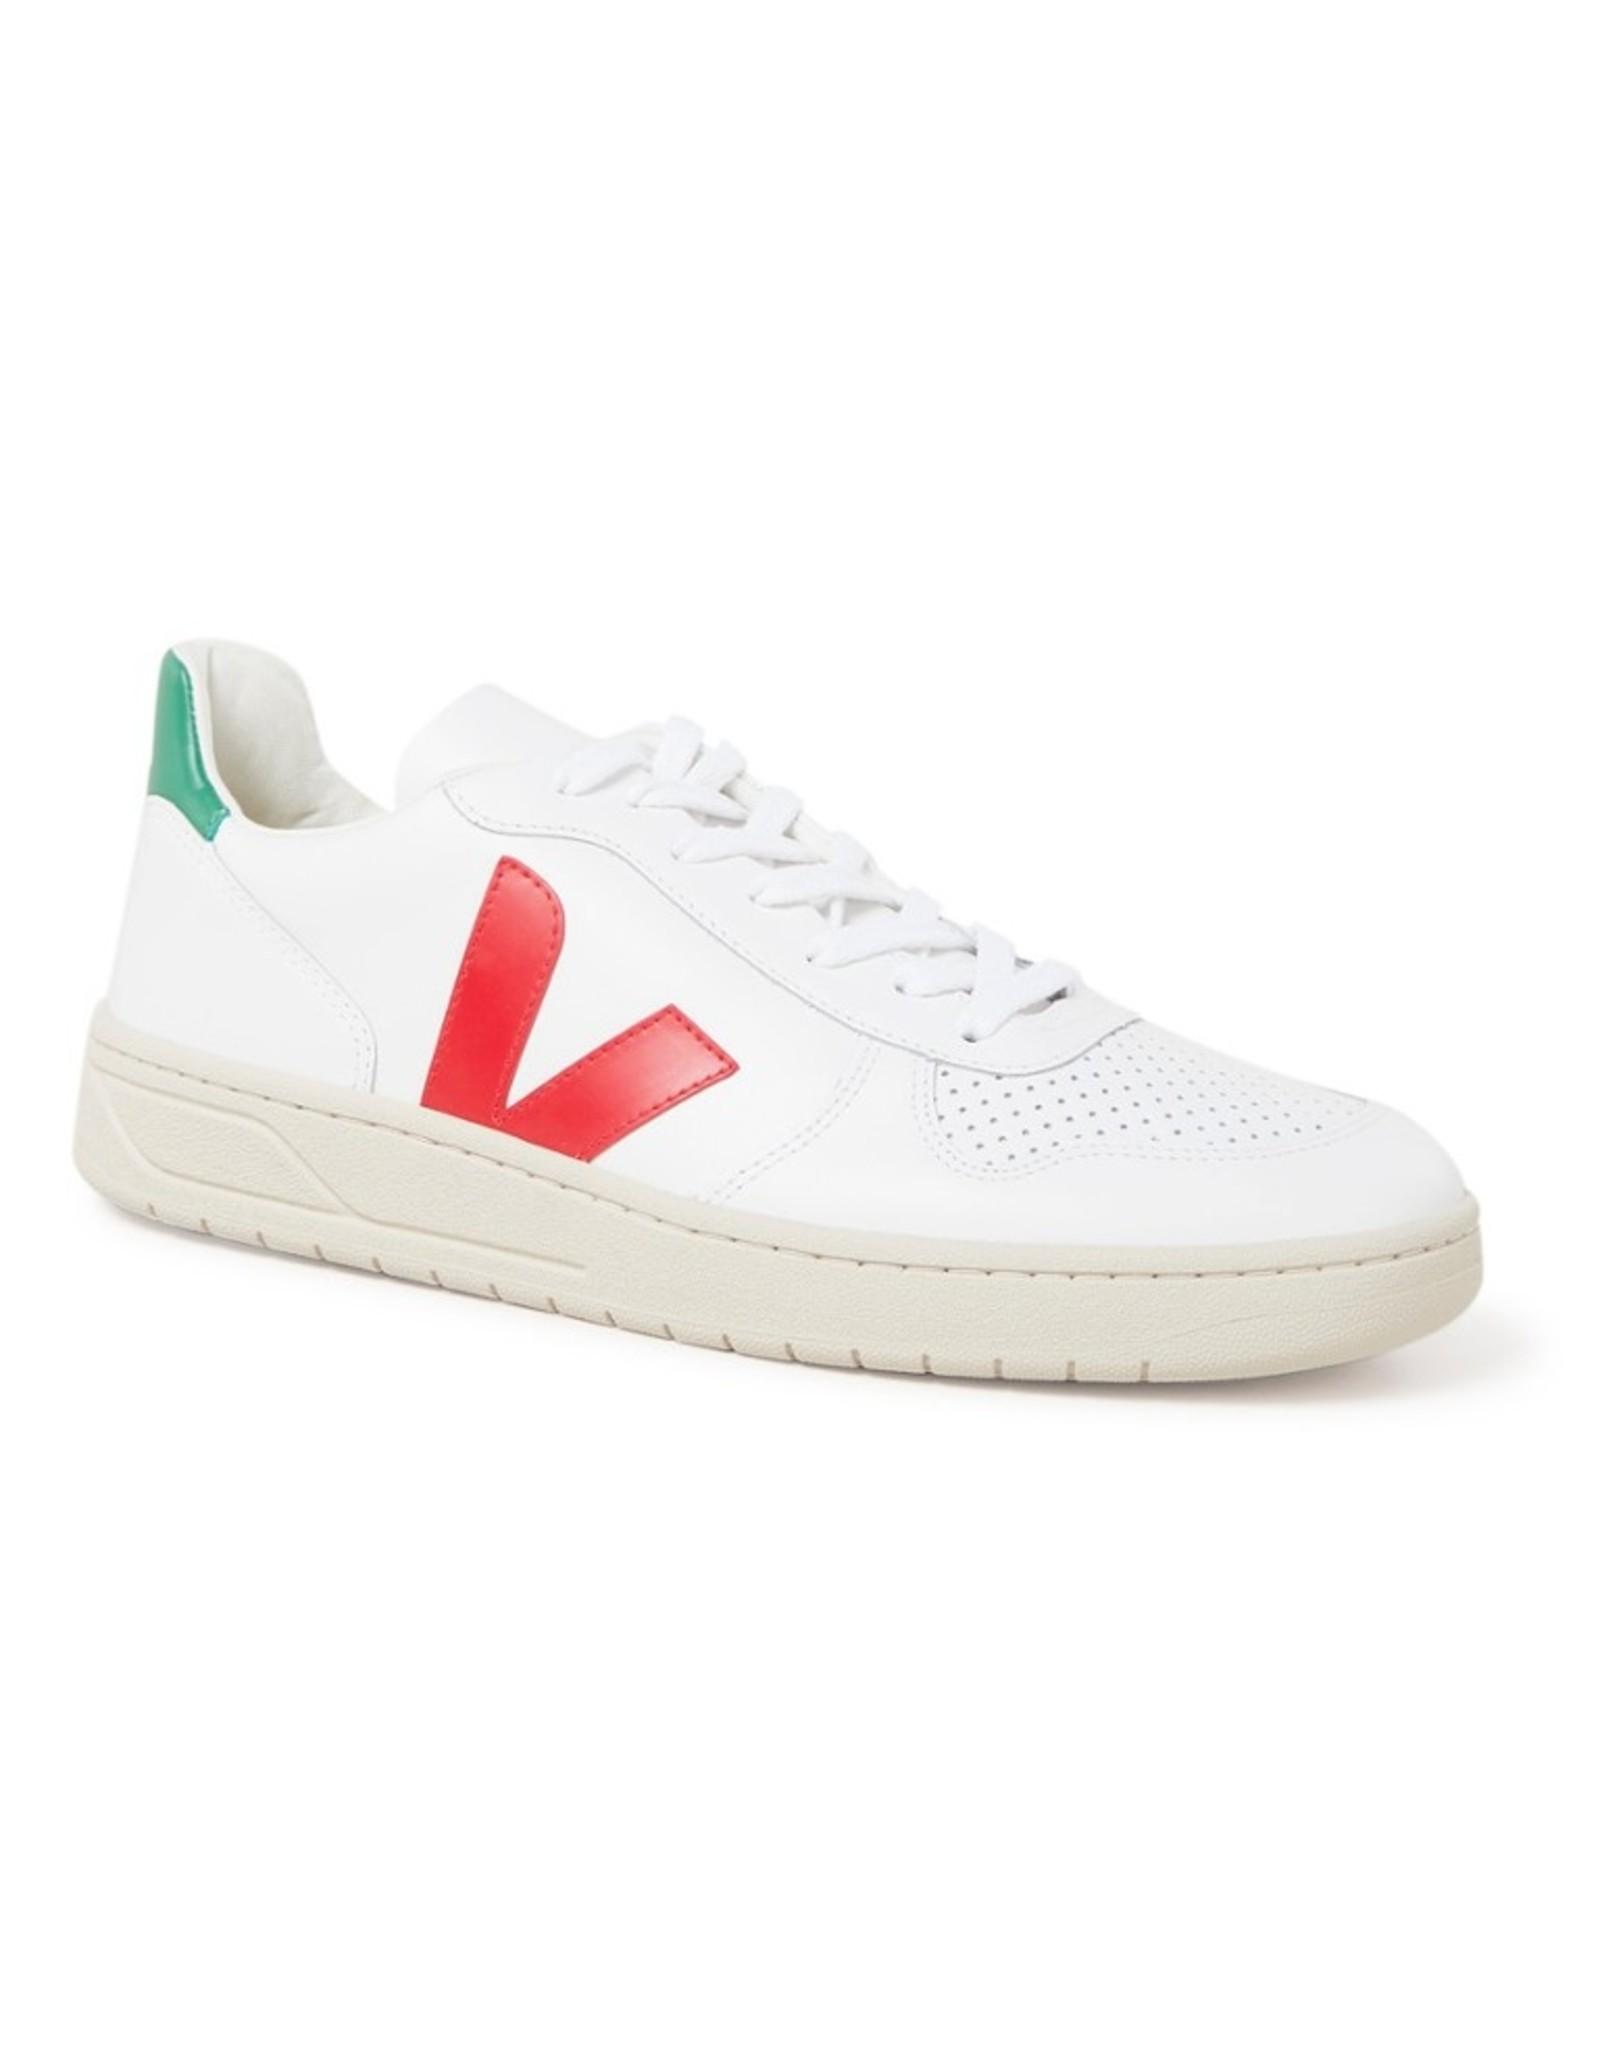 Veja V10 Leather Extra White Pekin Emeraude